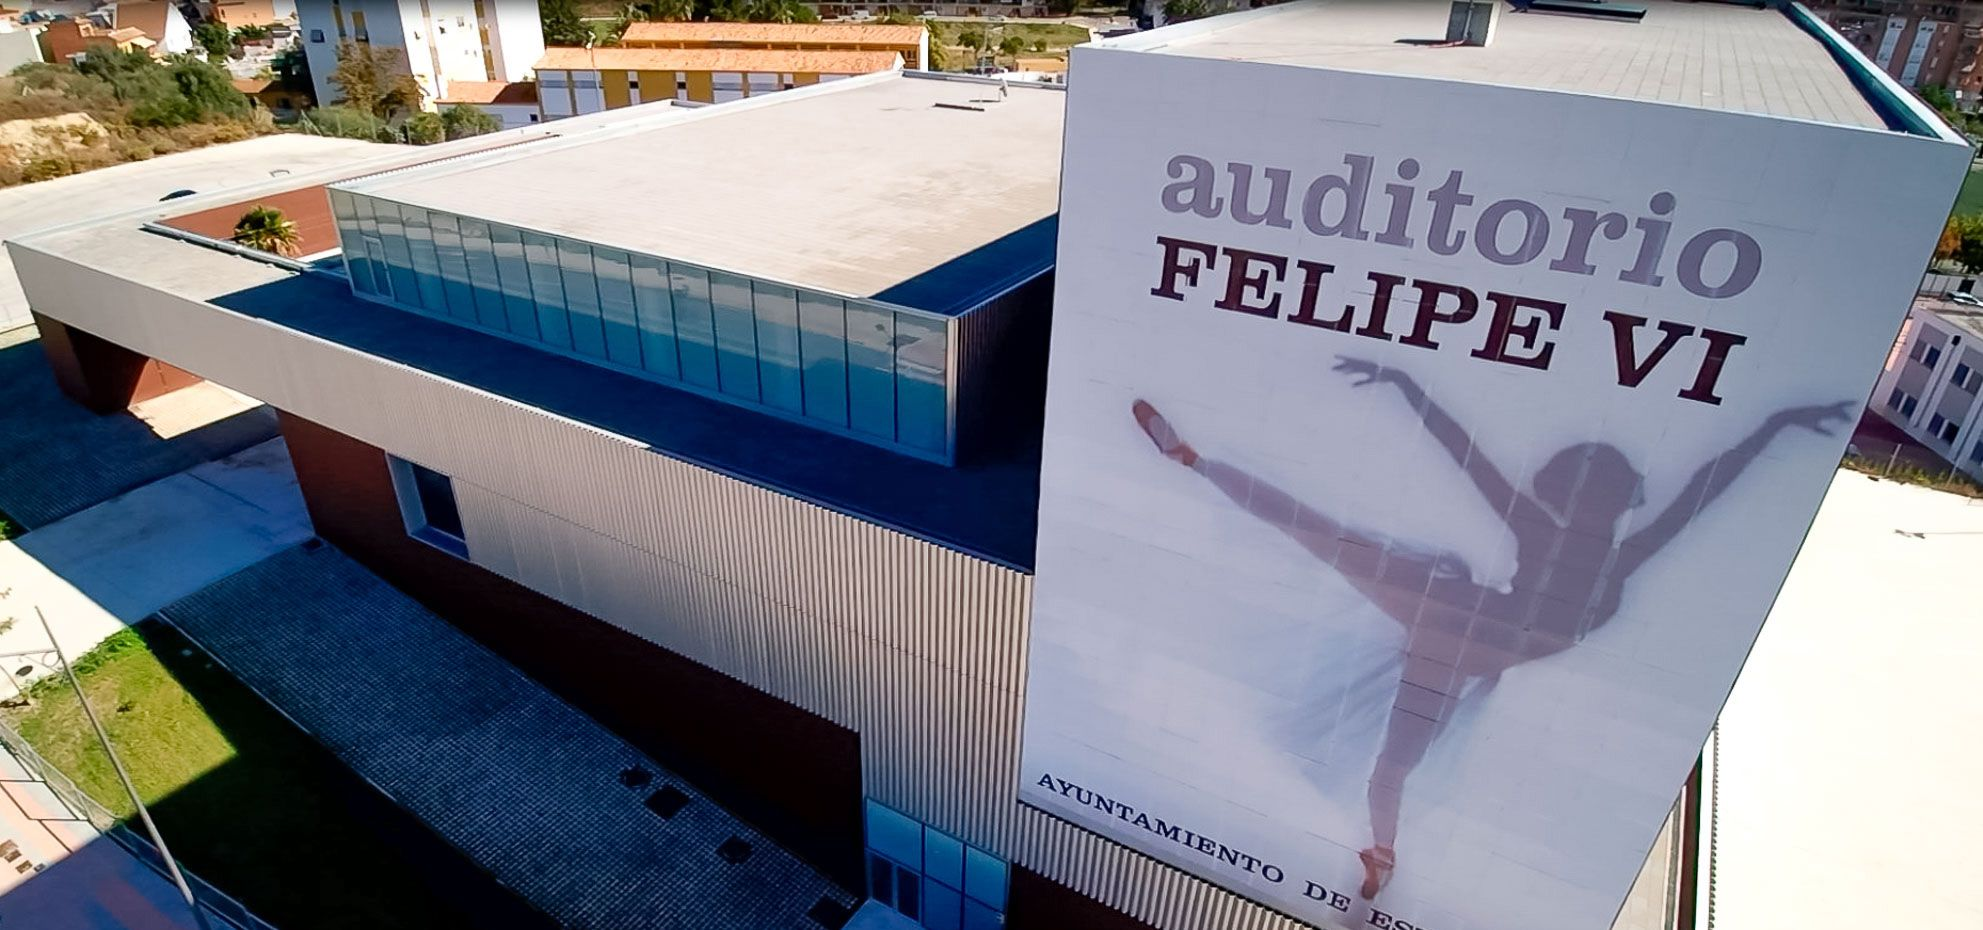 Auditorio Felipe VI, Estepona (Málaga)